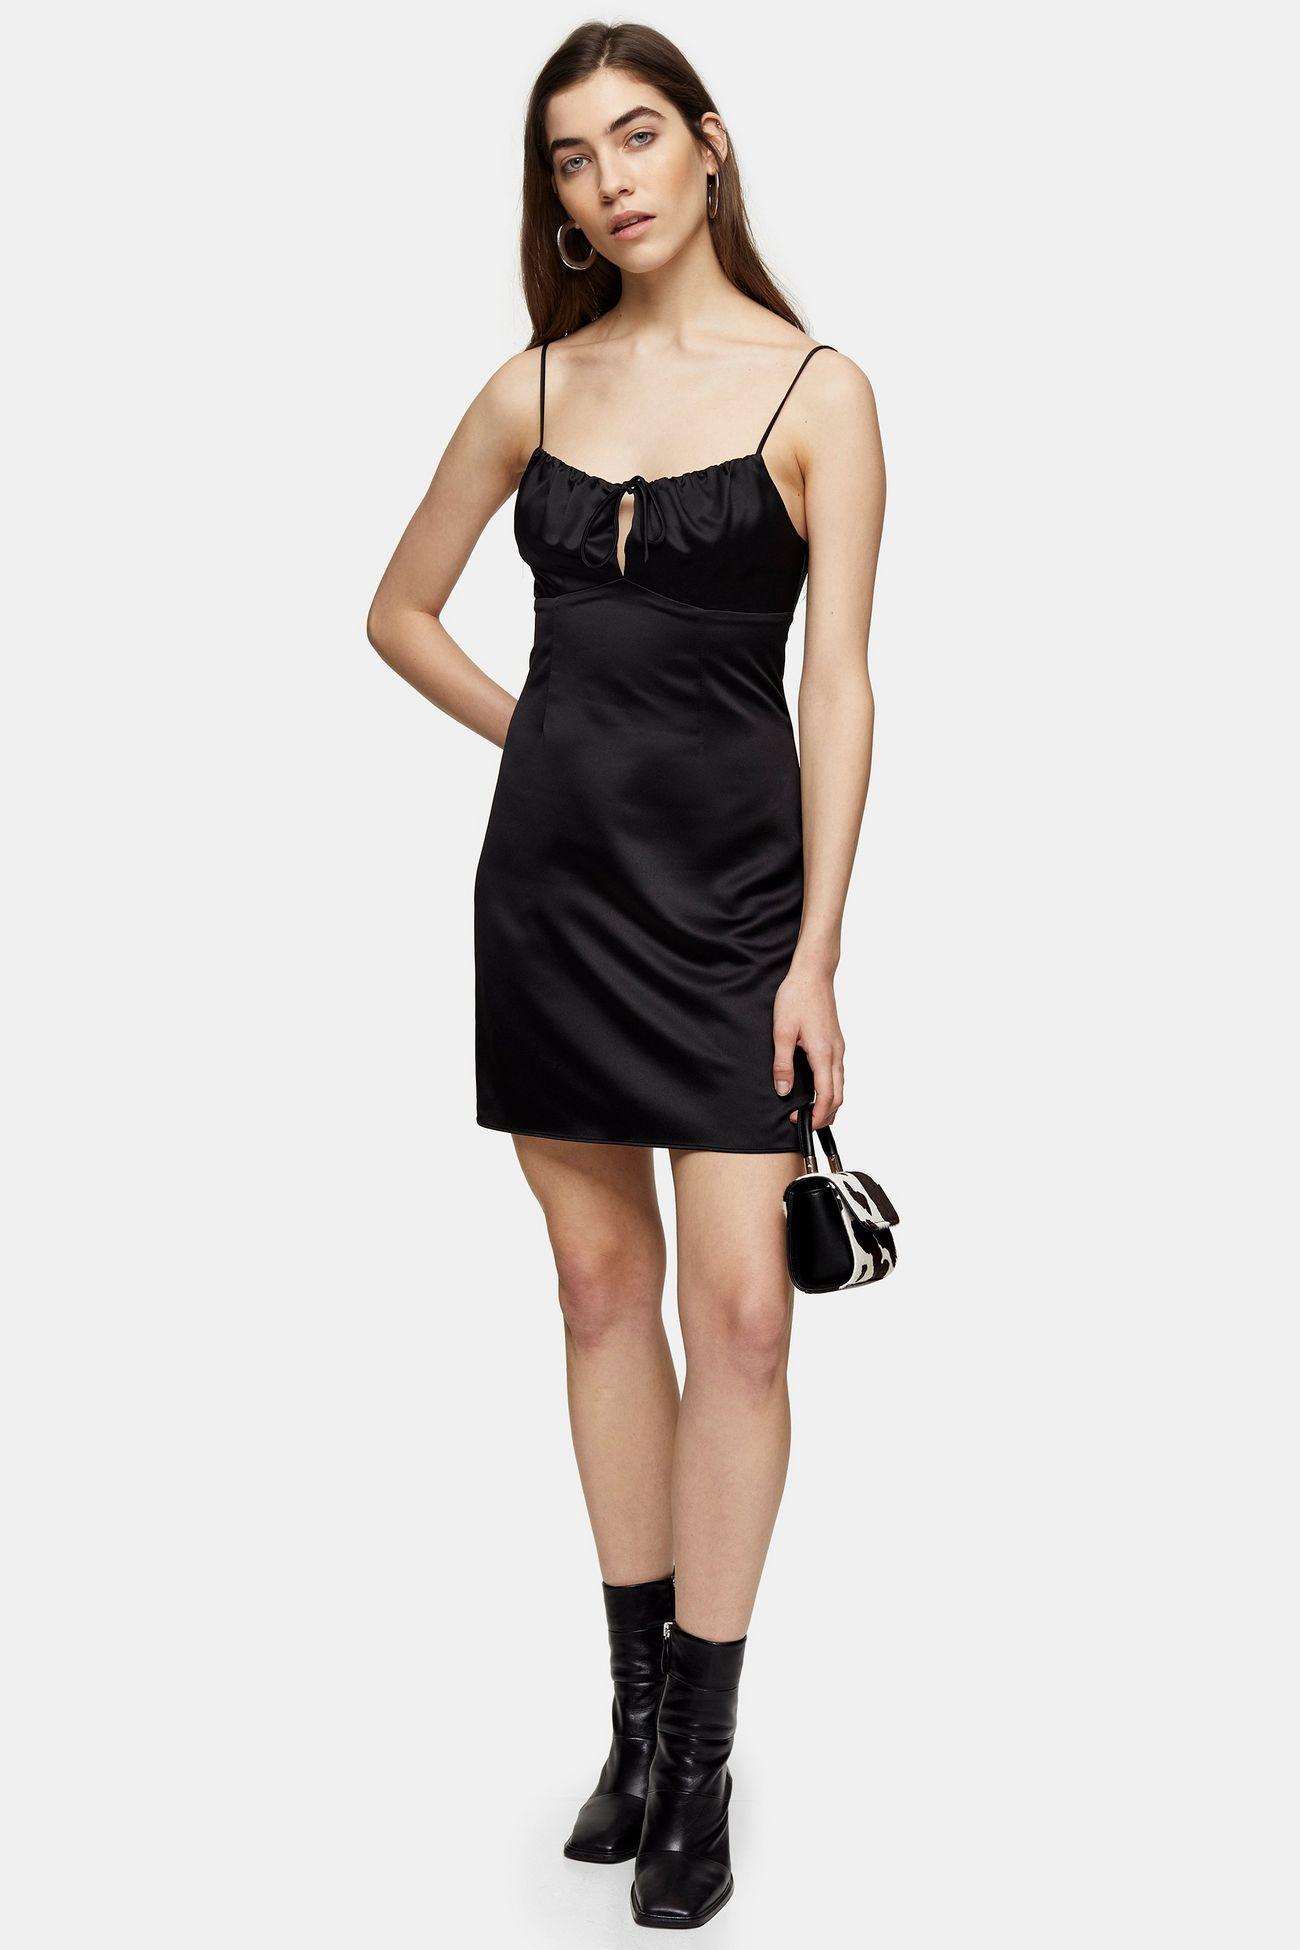 Susana Monaco Slip Dress Shopbop Slip Dress Outfit Mini Black Dress Night Dress [ 1206 x 750 Pixel ]